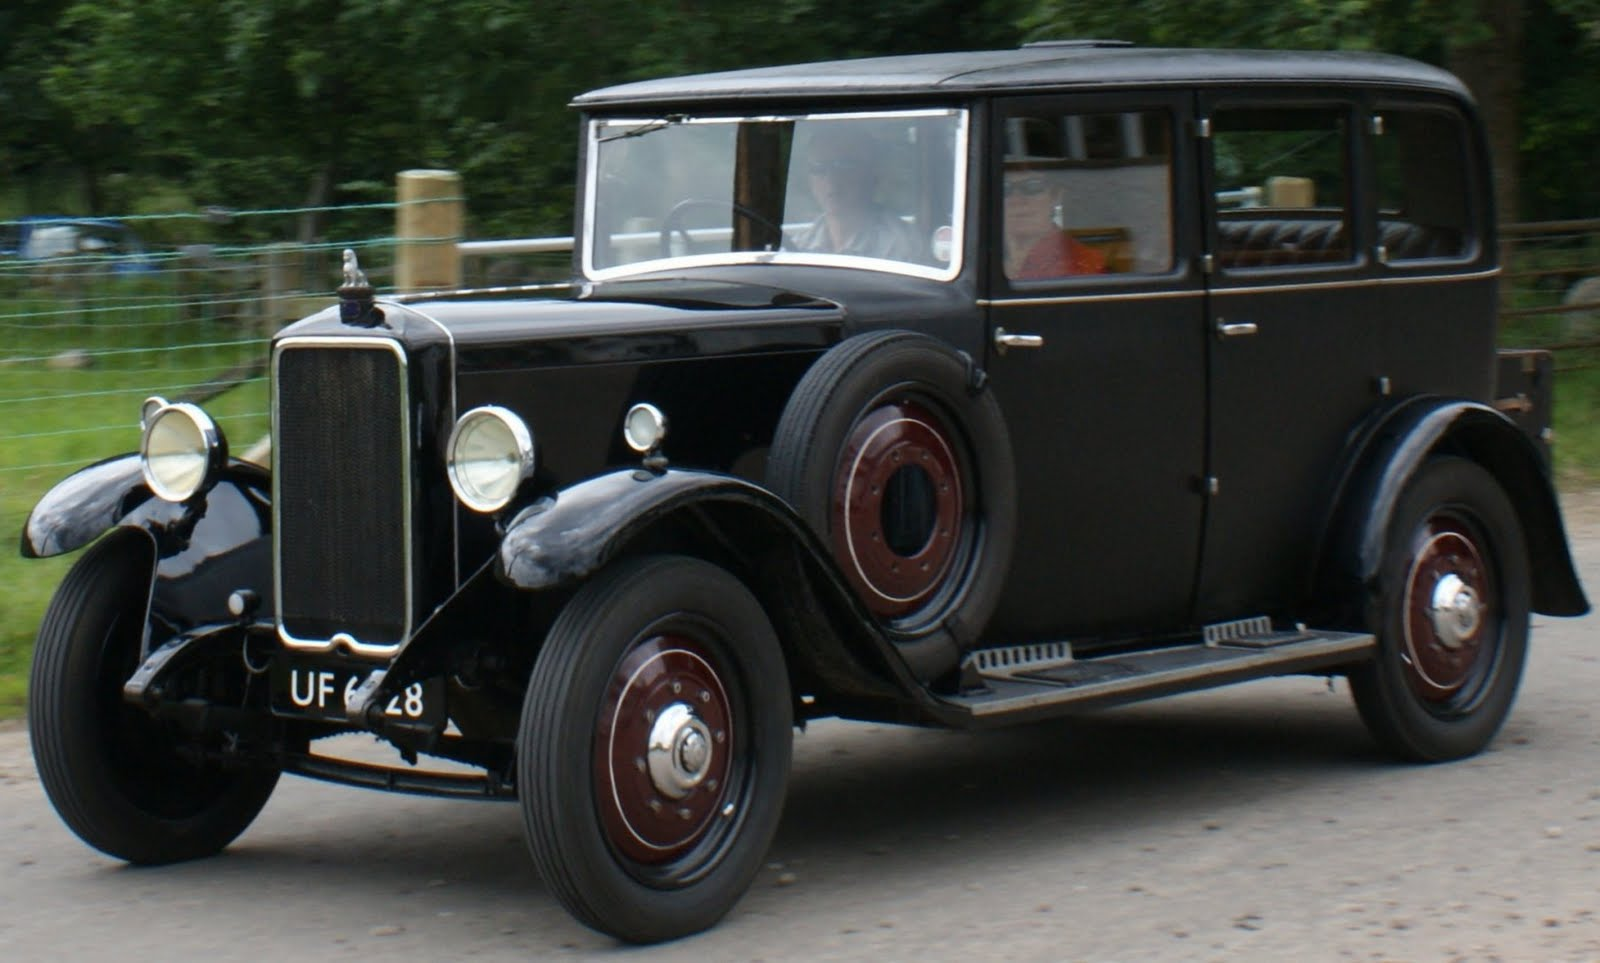 July 24th Photograph Vintage Cars Glen Clova Scotland | Tour ...